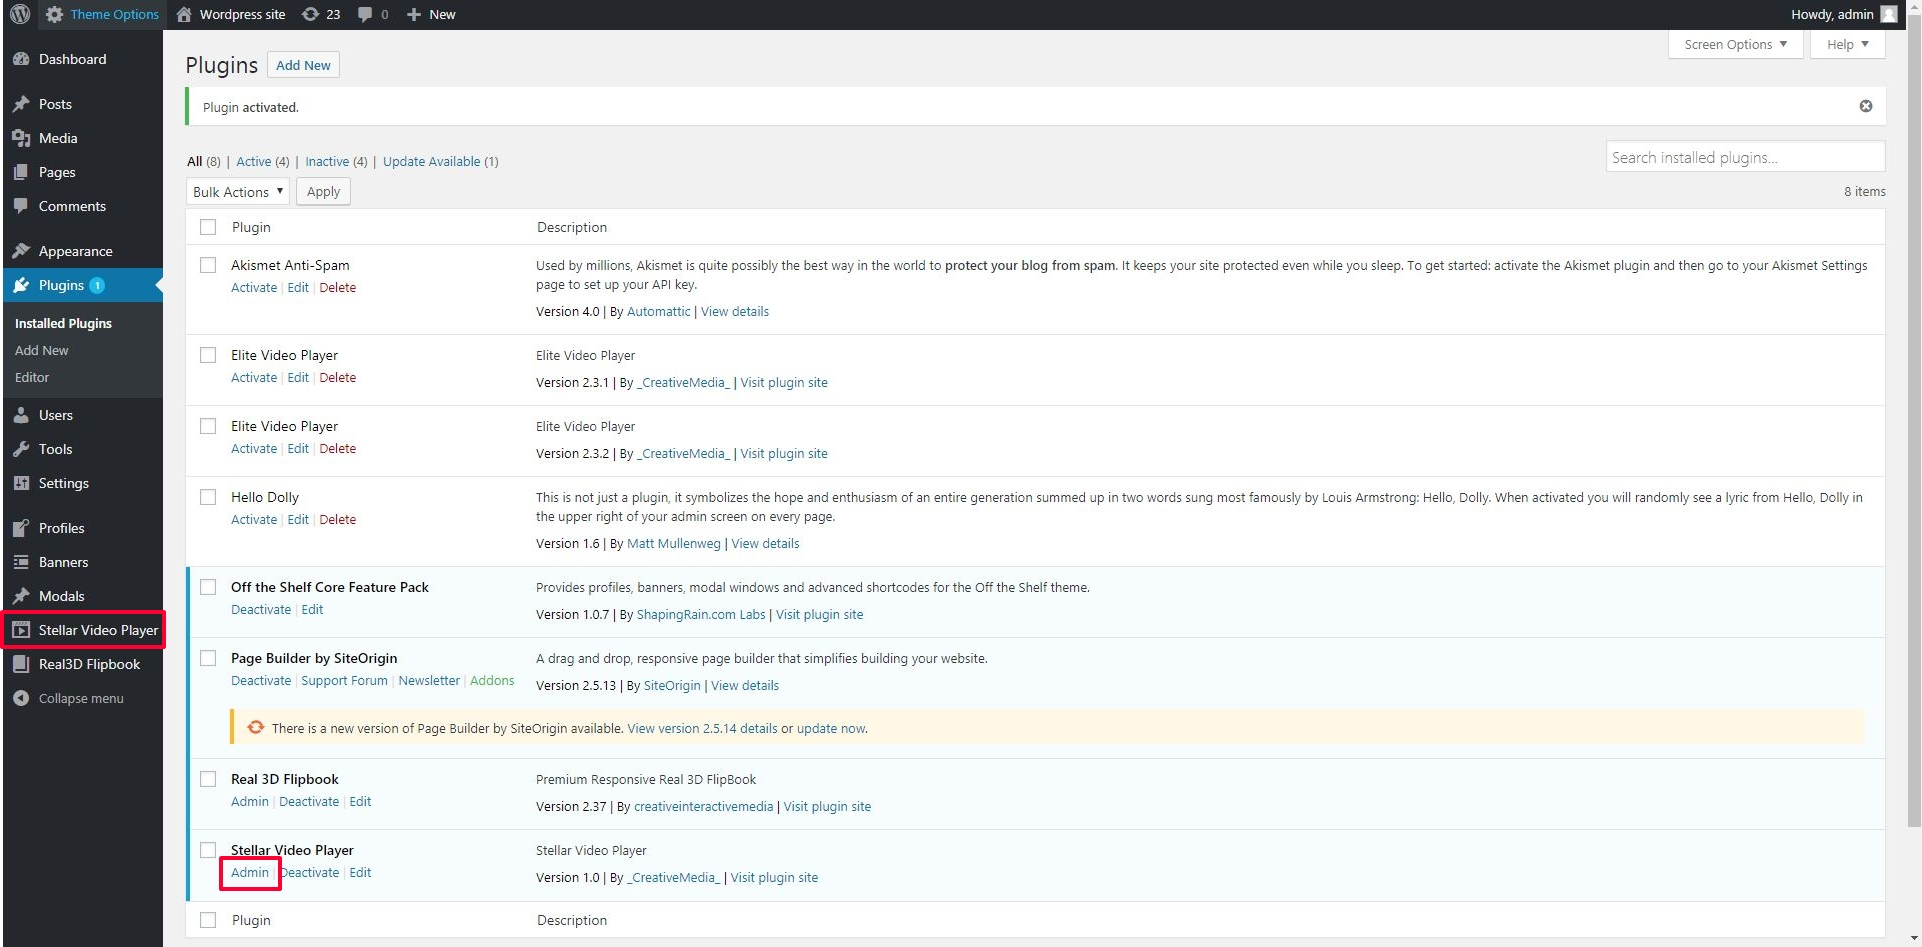 Stellar Video Player - WordPress plugin